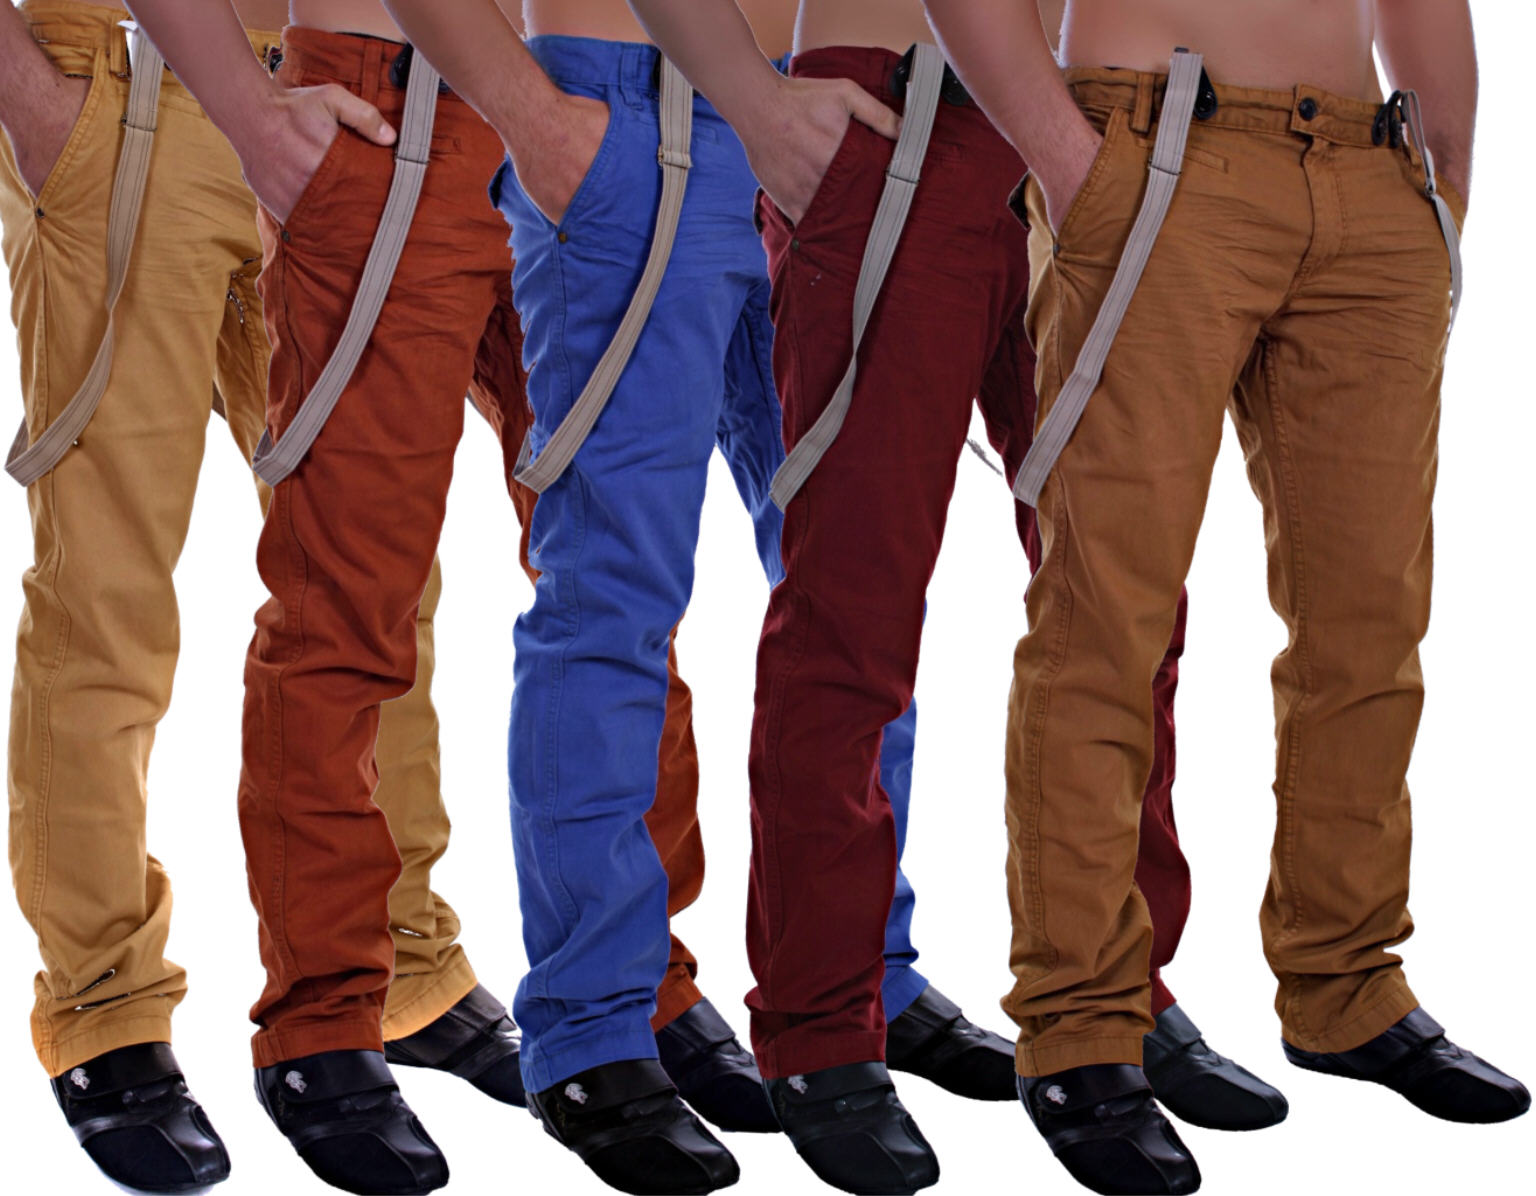 chino hose hosentr ger herren hose trousers jeans w29 30. Black Bedroom Furniture Sets. Home Design Ideas